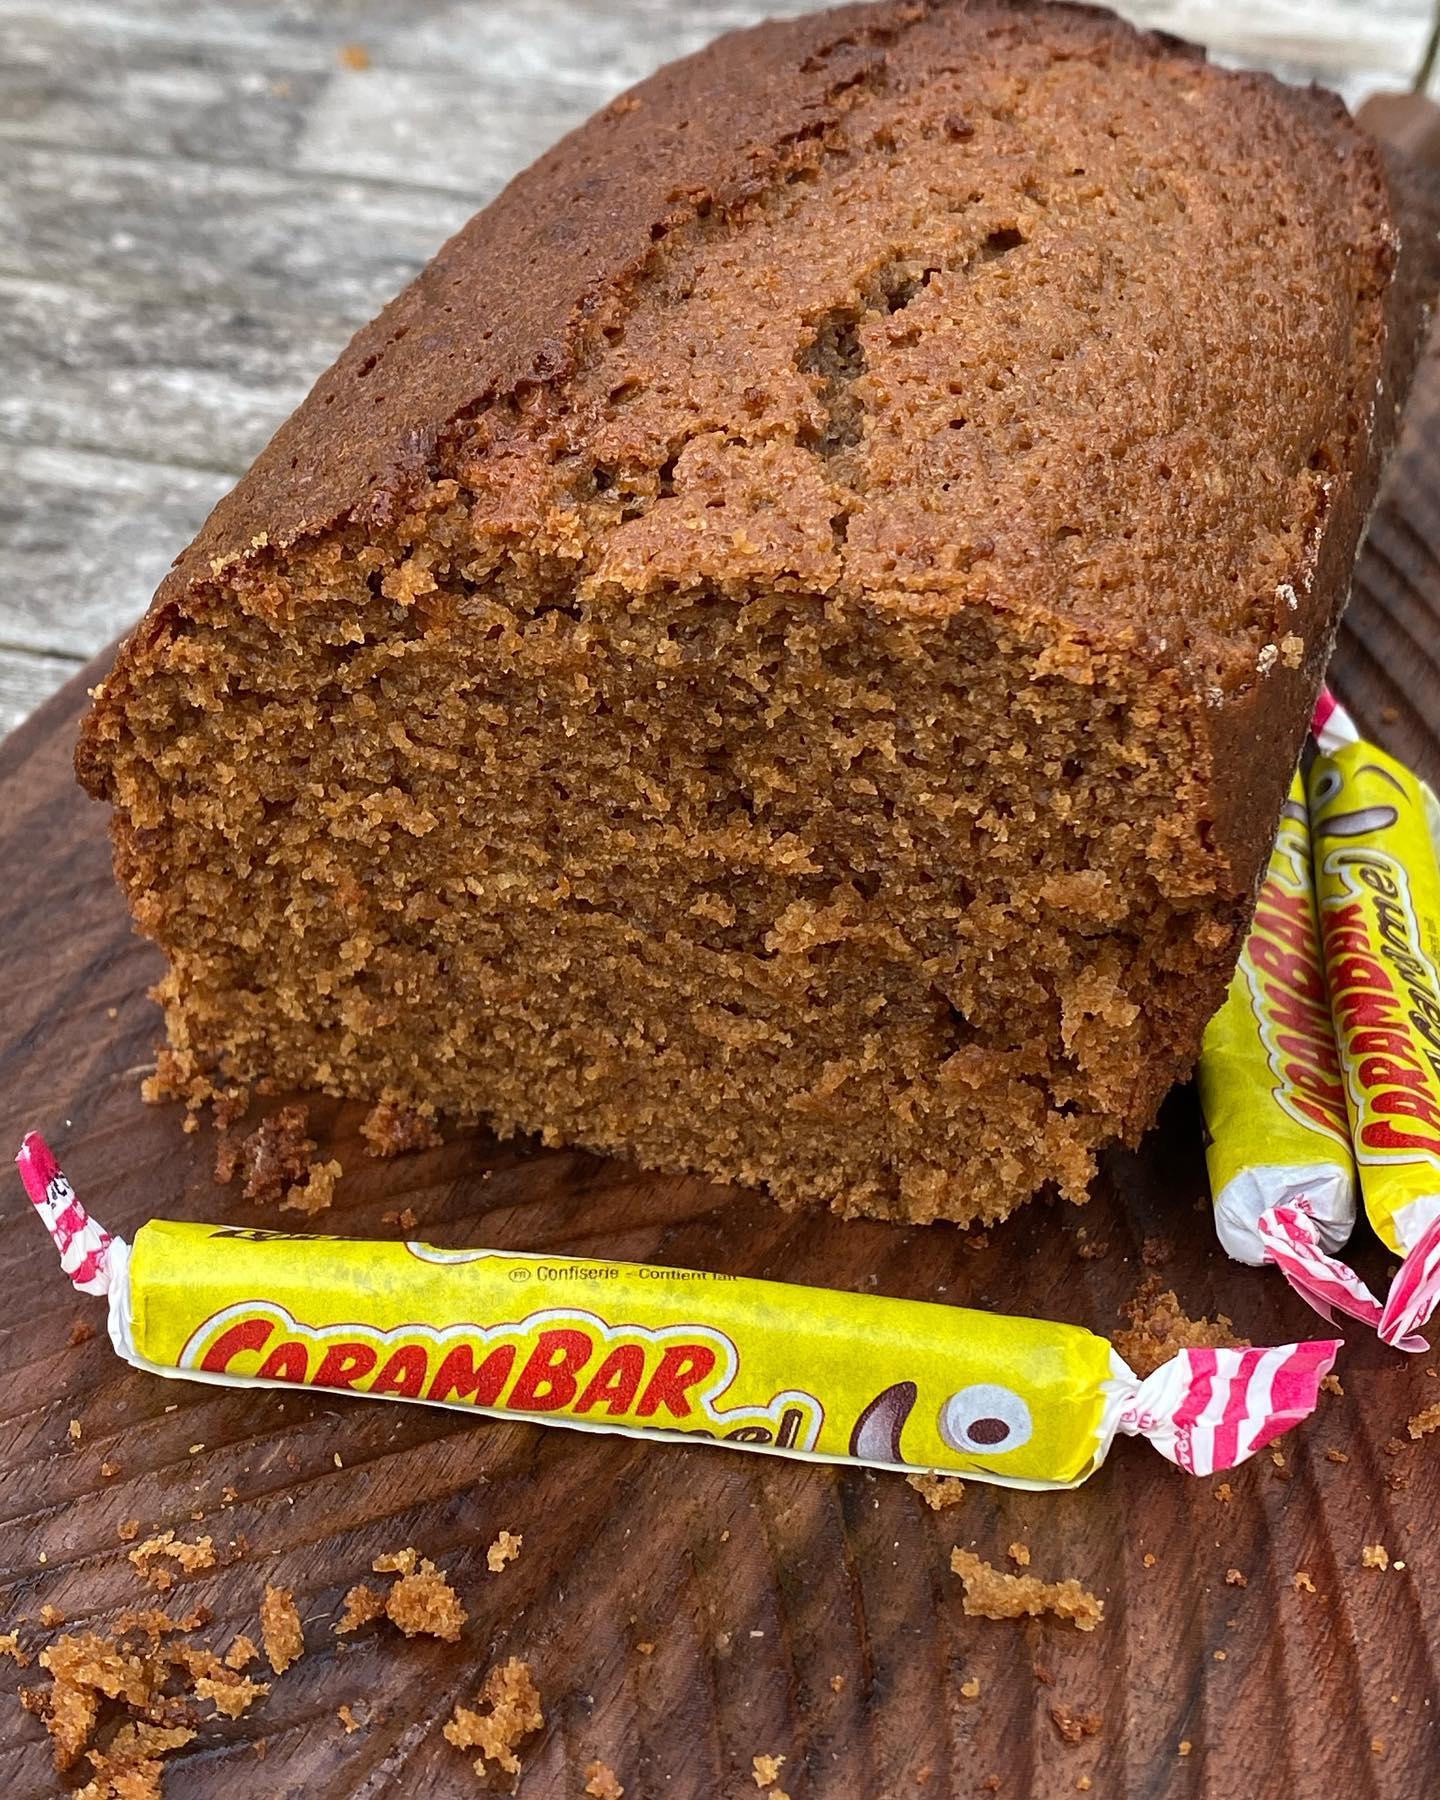 Gâteau aux Carambar